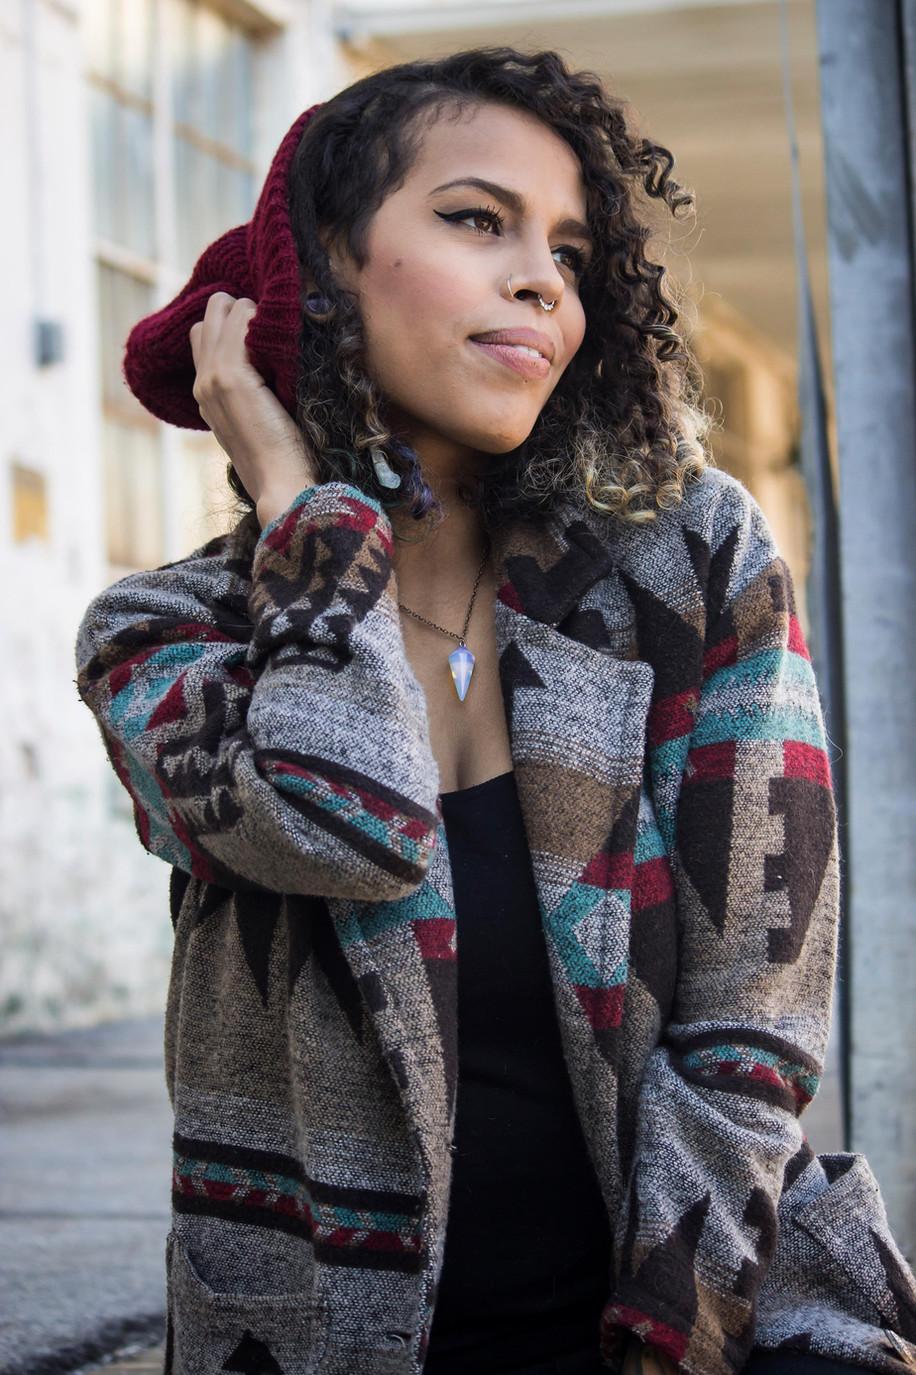 Photographer: Alex Turner | MUAH/Model: Ruby Noir